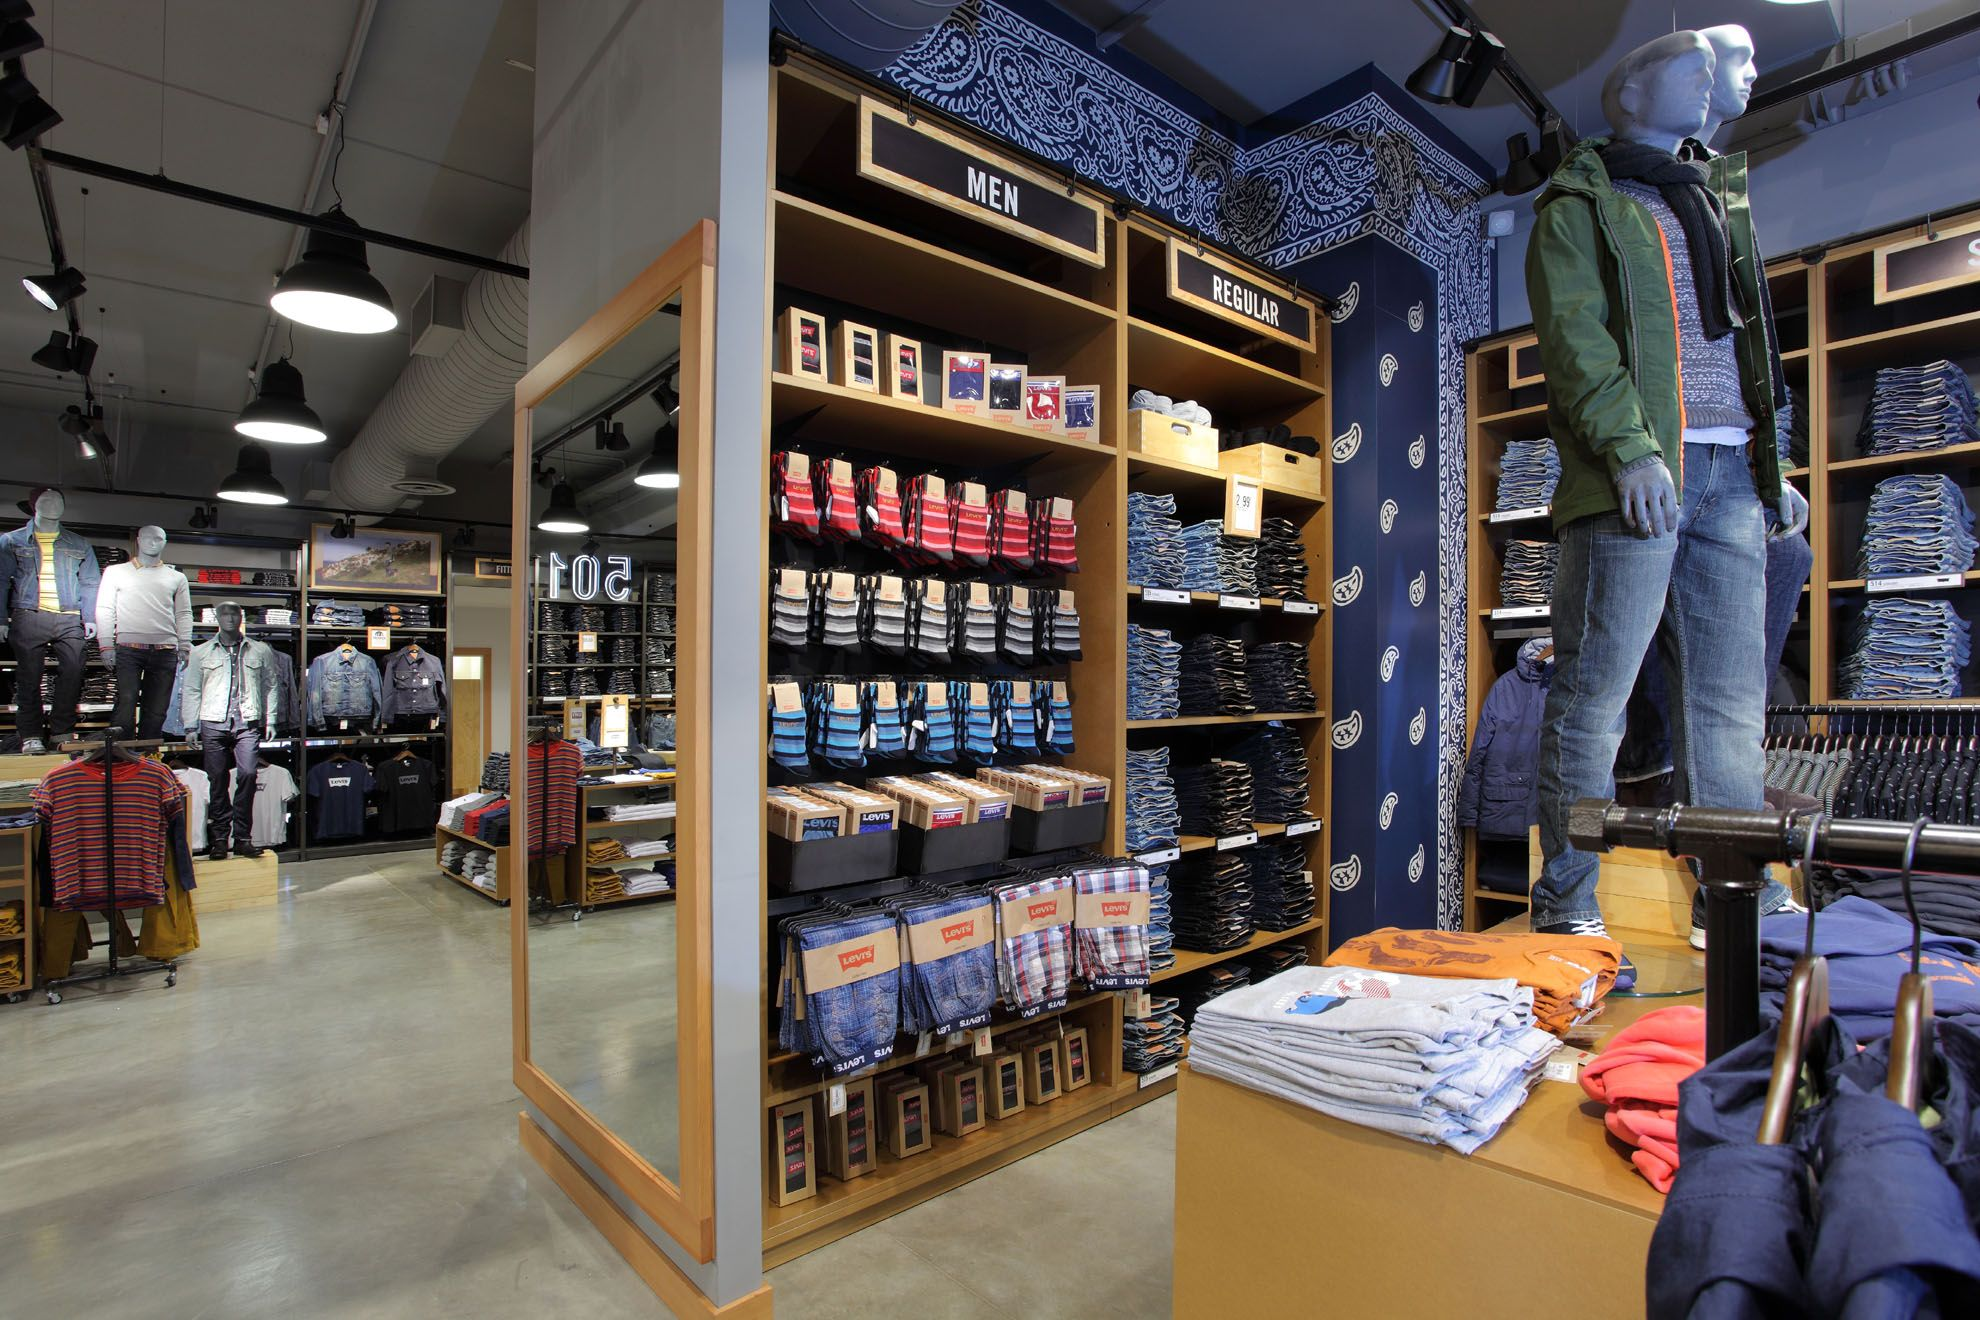 mosaico mondo vela  Levi's (Store) @Serravalle By AD Store & More #design #store #retail  #contract #work #managment #shop #ADSM